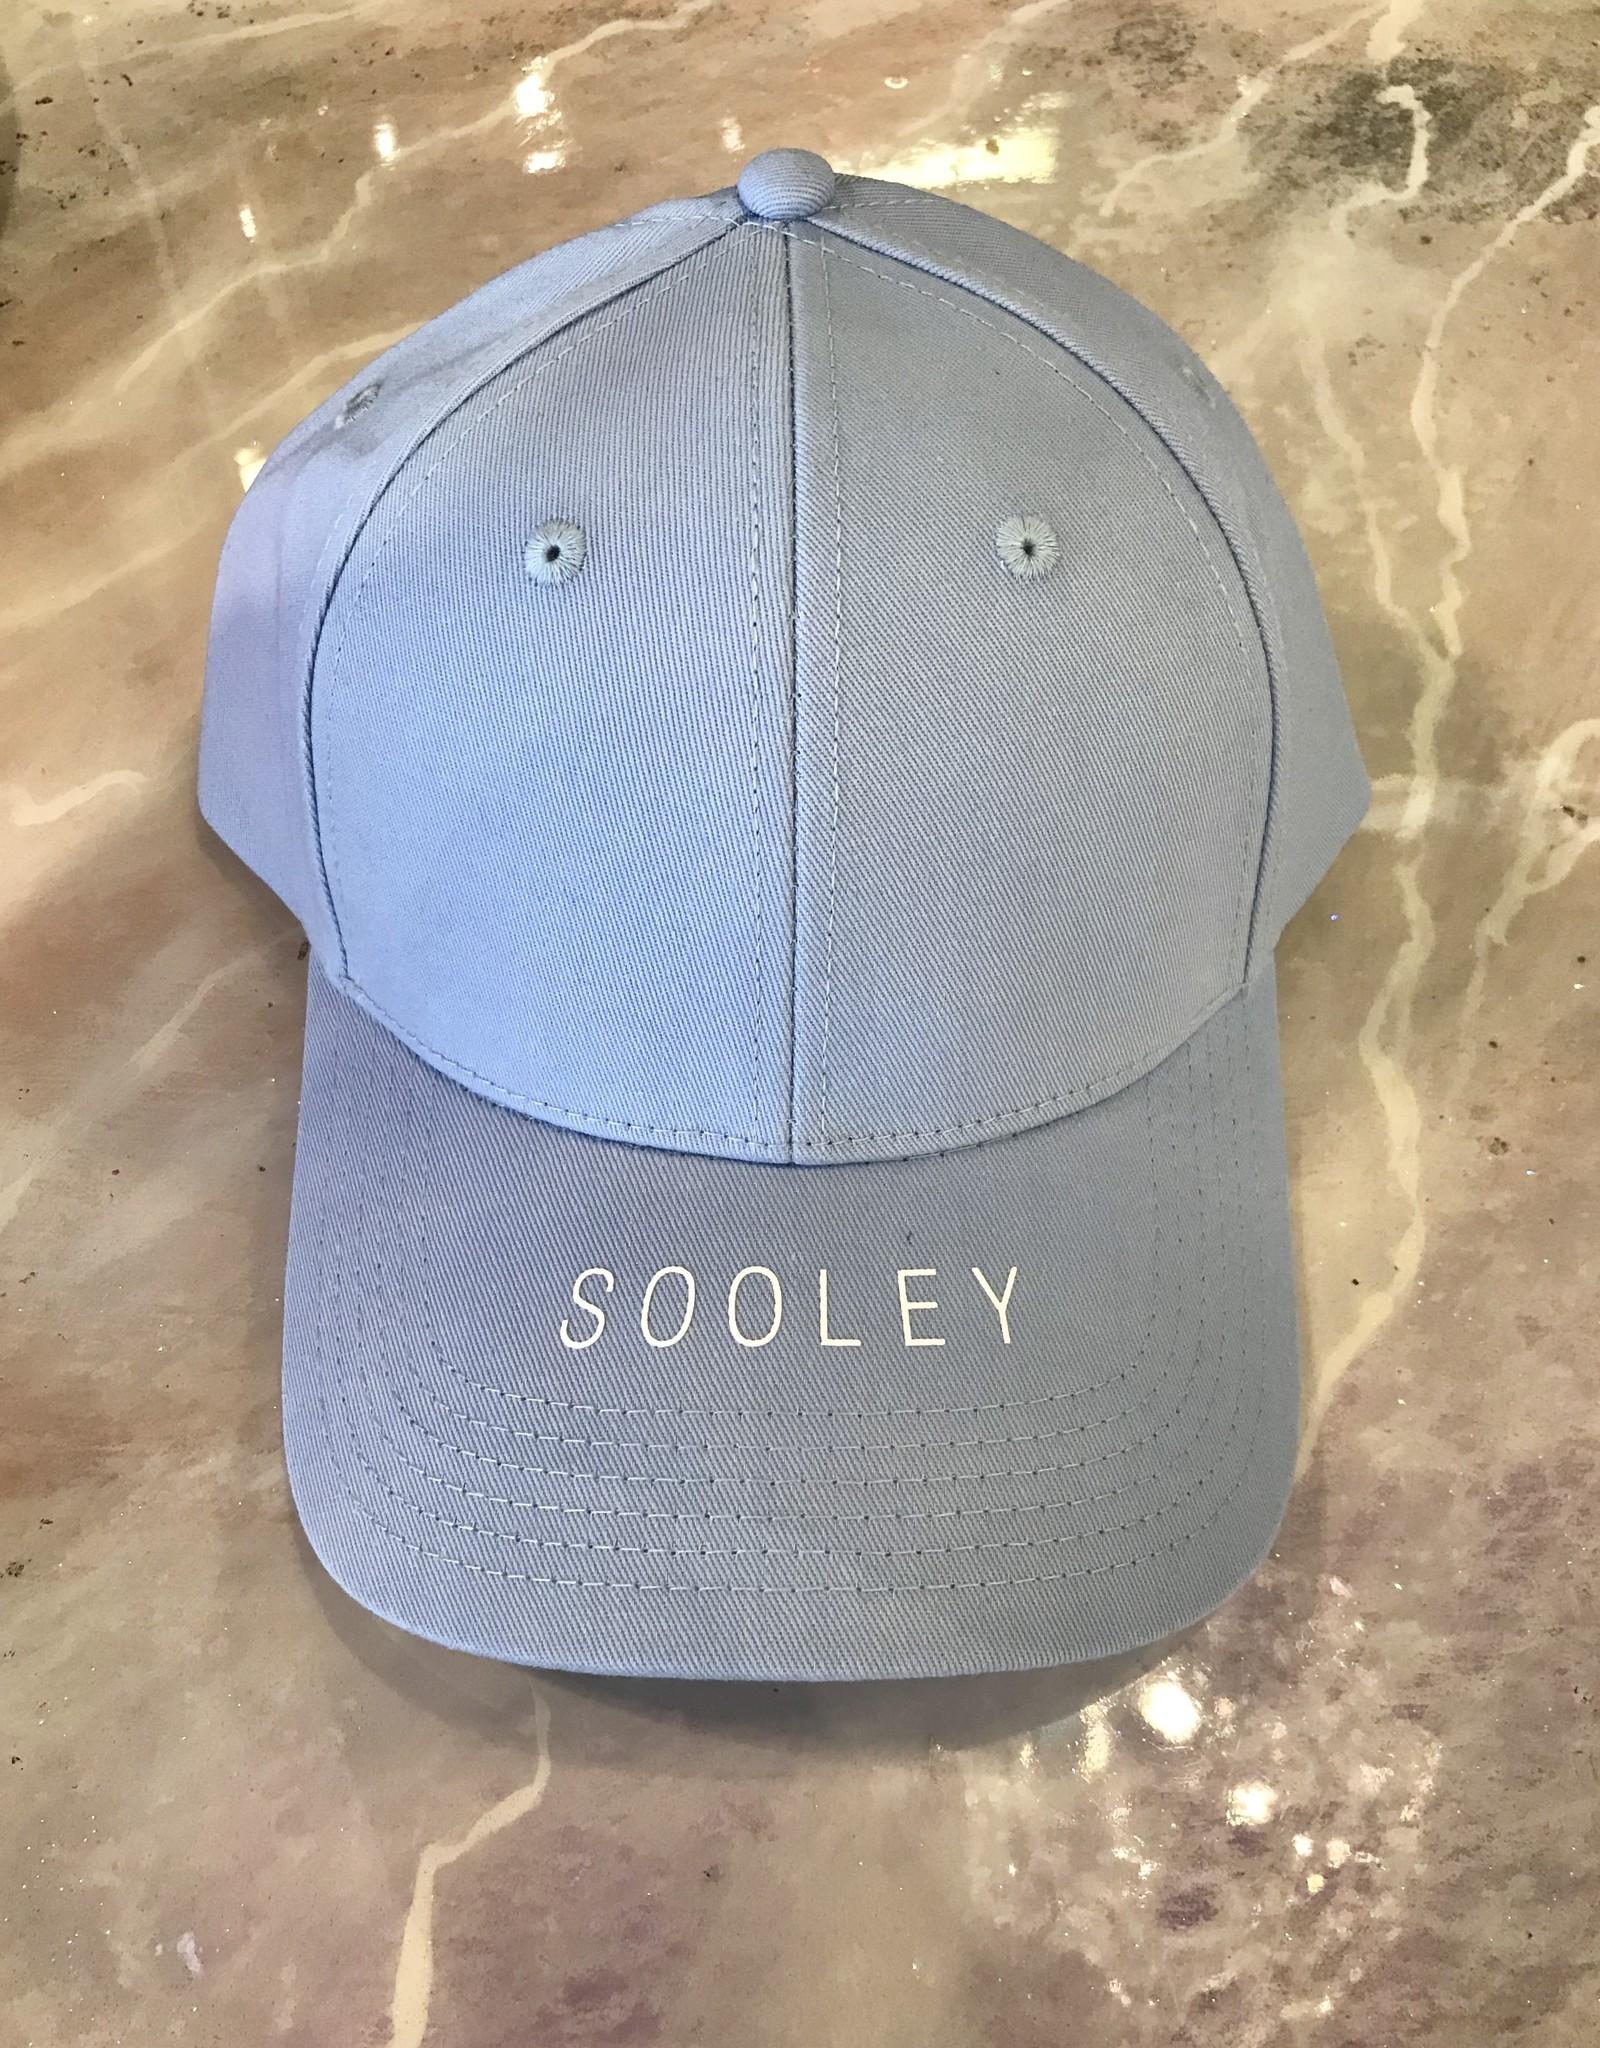 Sooley Baseball Hat - Baby Blue